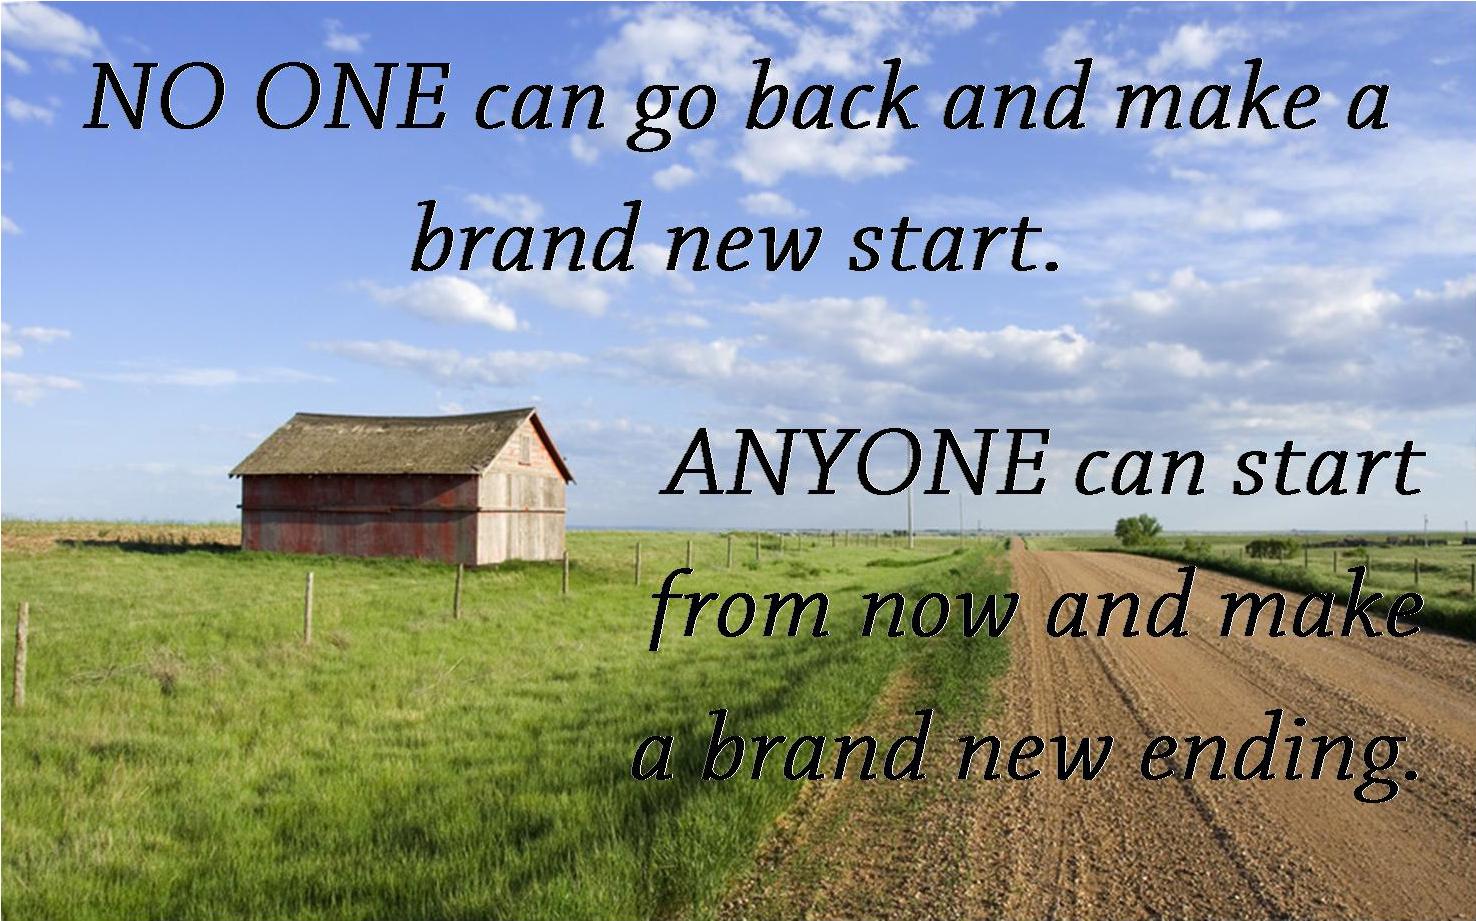 Brand New Day Quotes: Academic Advising Quotes. QuotesGram